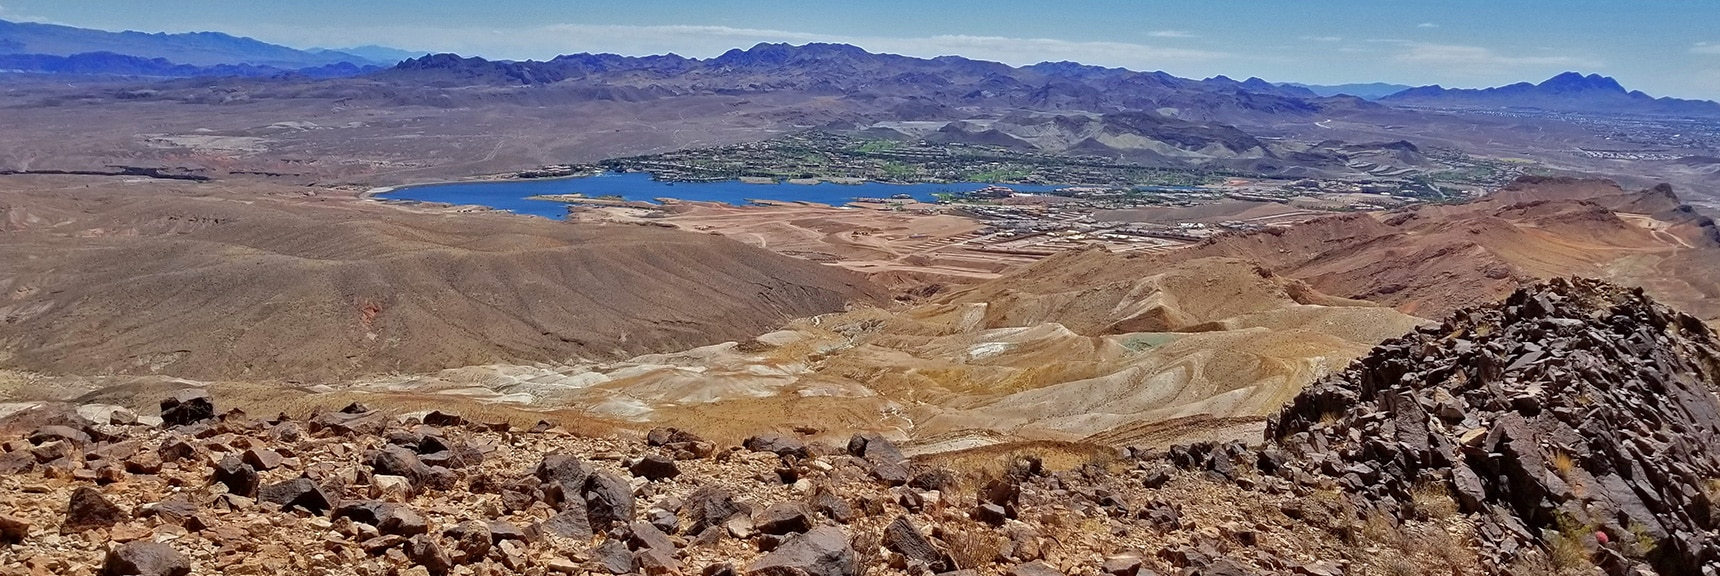 South Ridge Saddle Where I Turned Right (West) to Descend | Lava Butte | Lake Mead National Recreation Area, Nevada